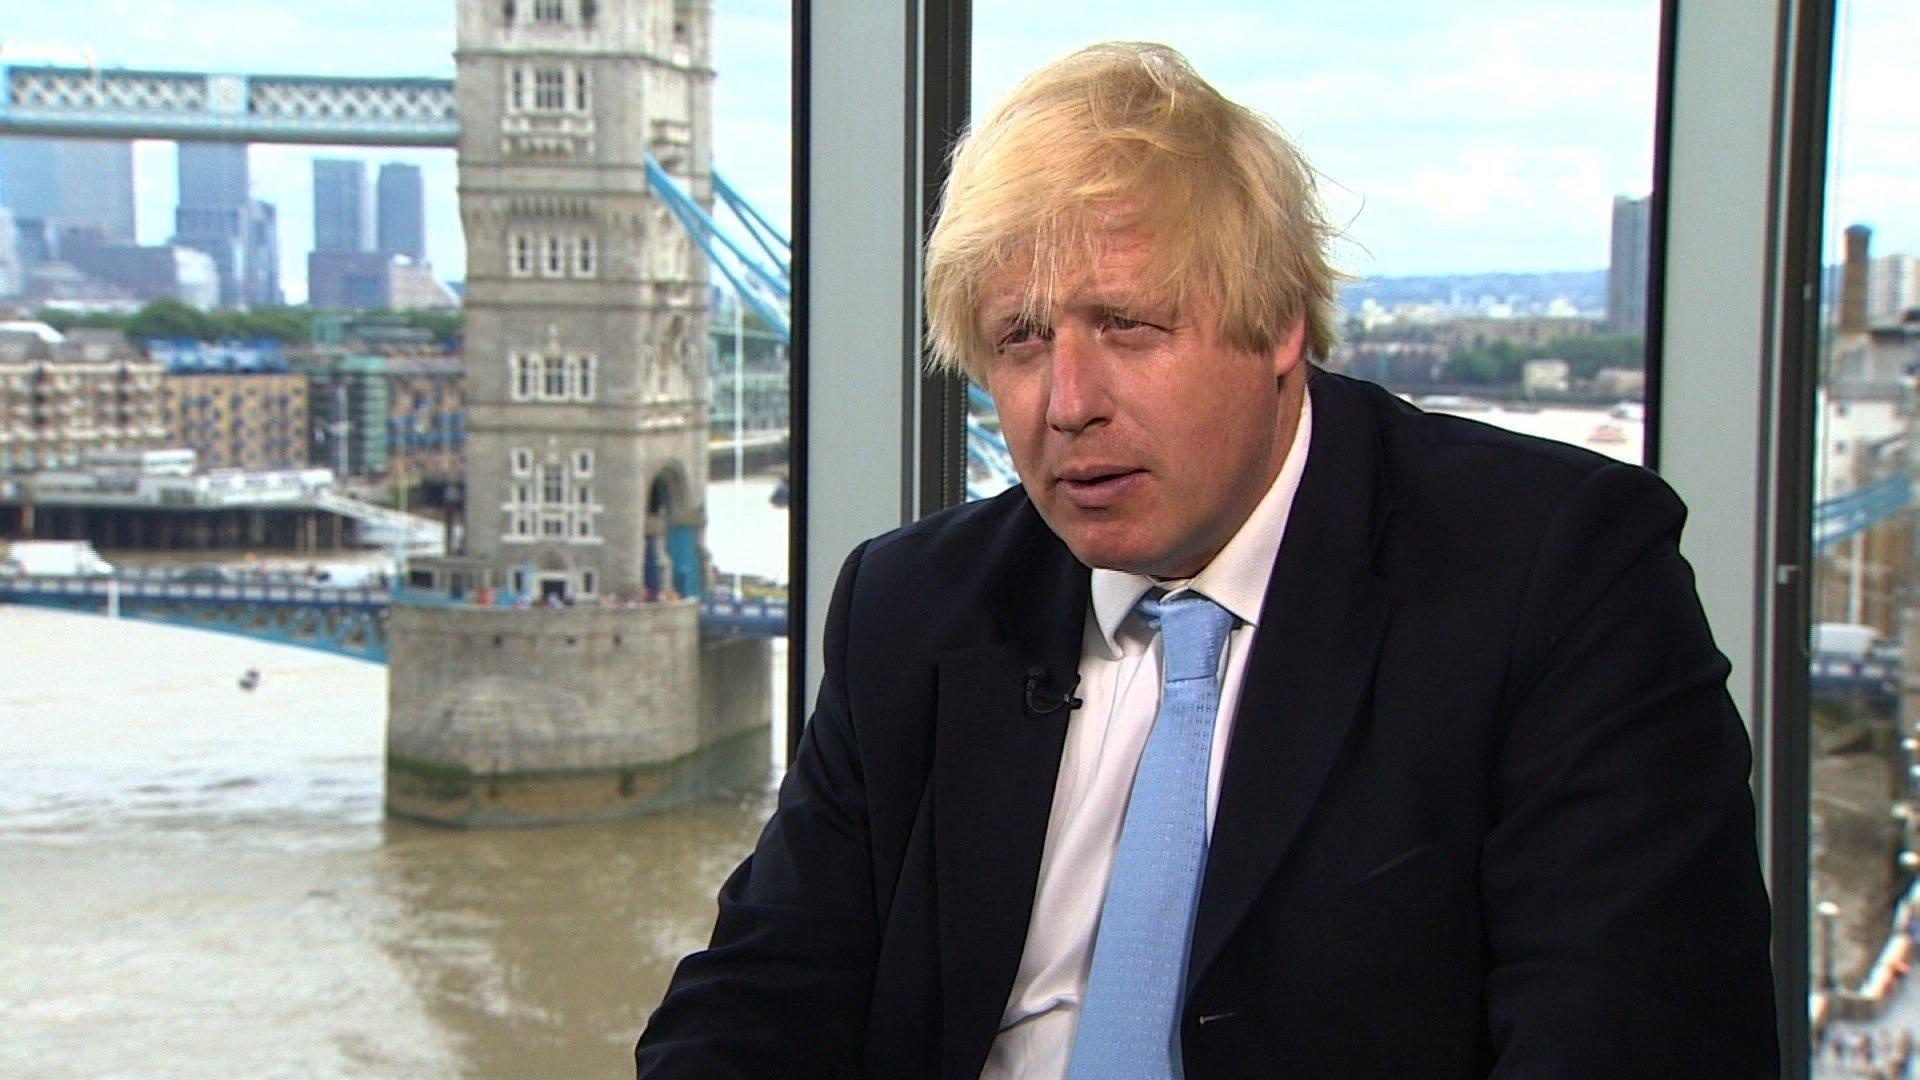 EU Parliament Brexit Negotiator Calls UK Offer on EU Citizens 'Damp Squib'